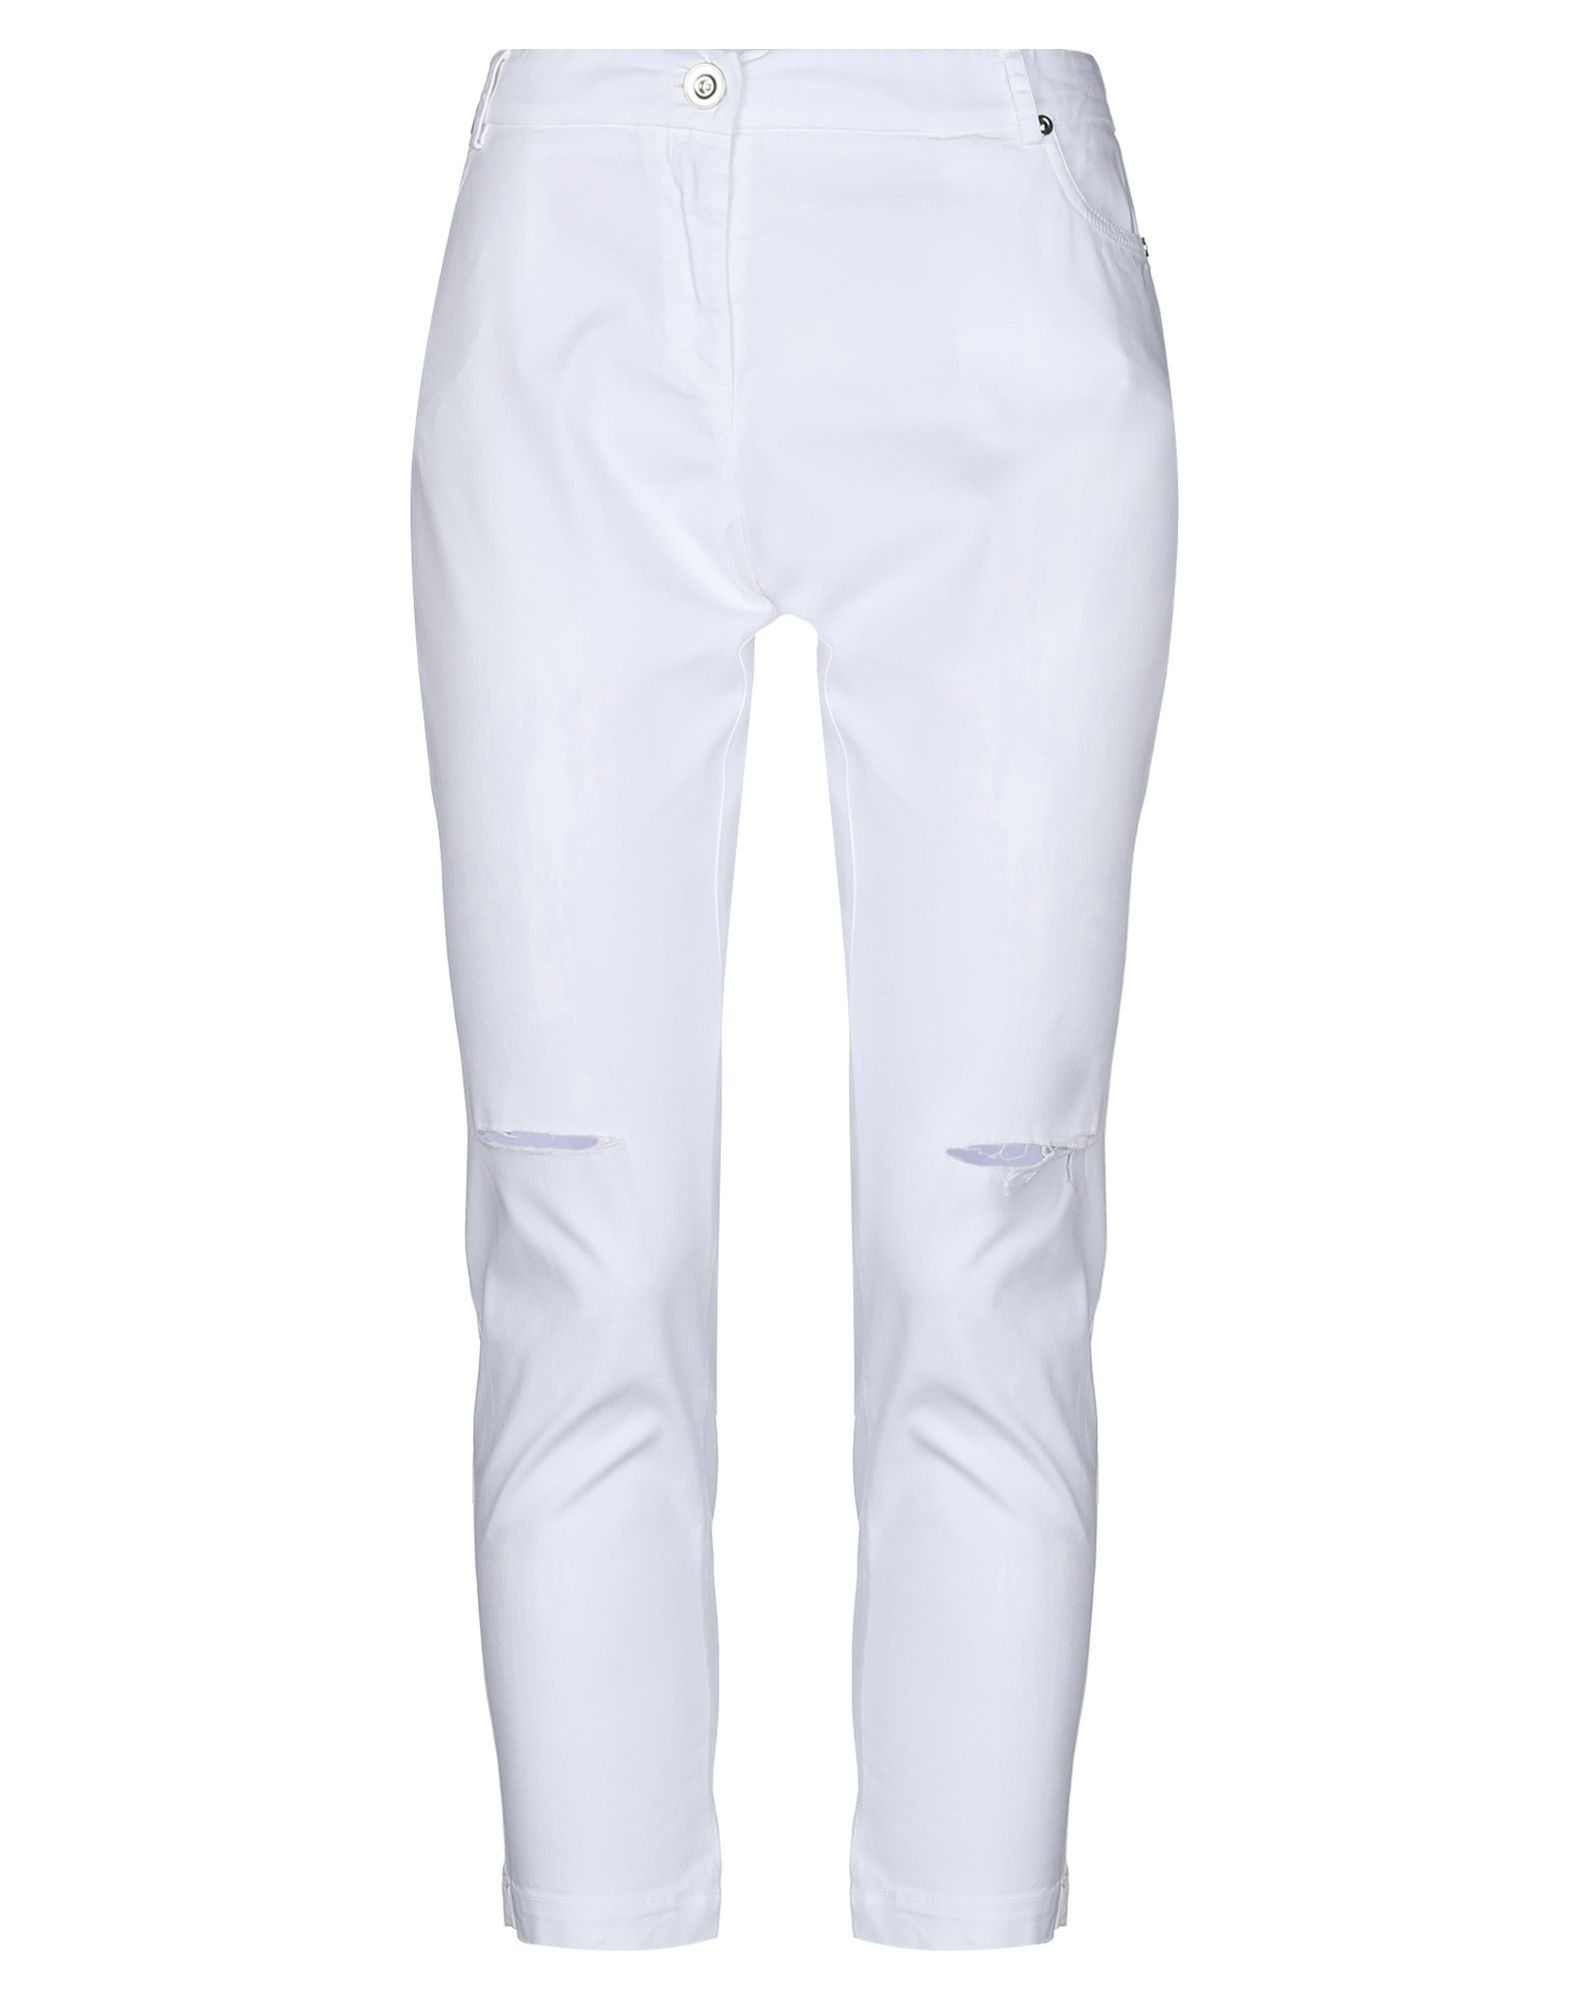 Pantalone Pantalone Toy G. donna - 13083394QD  gute Qualität